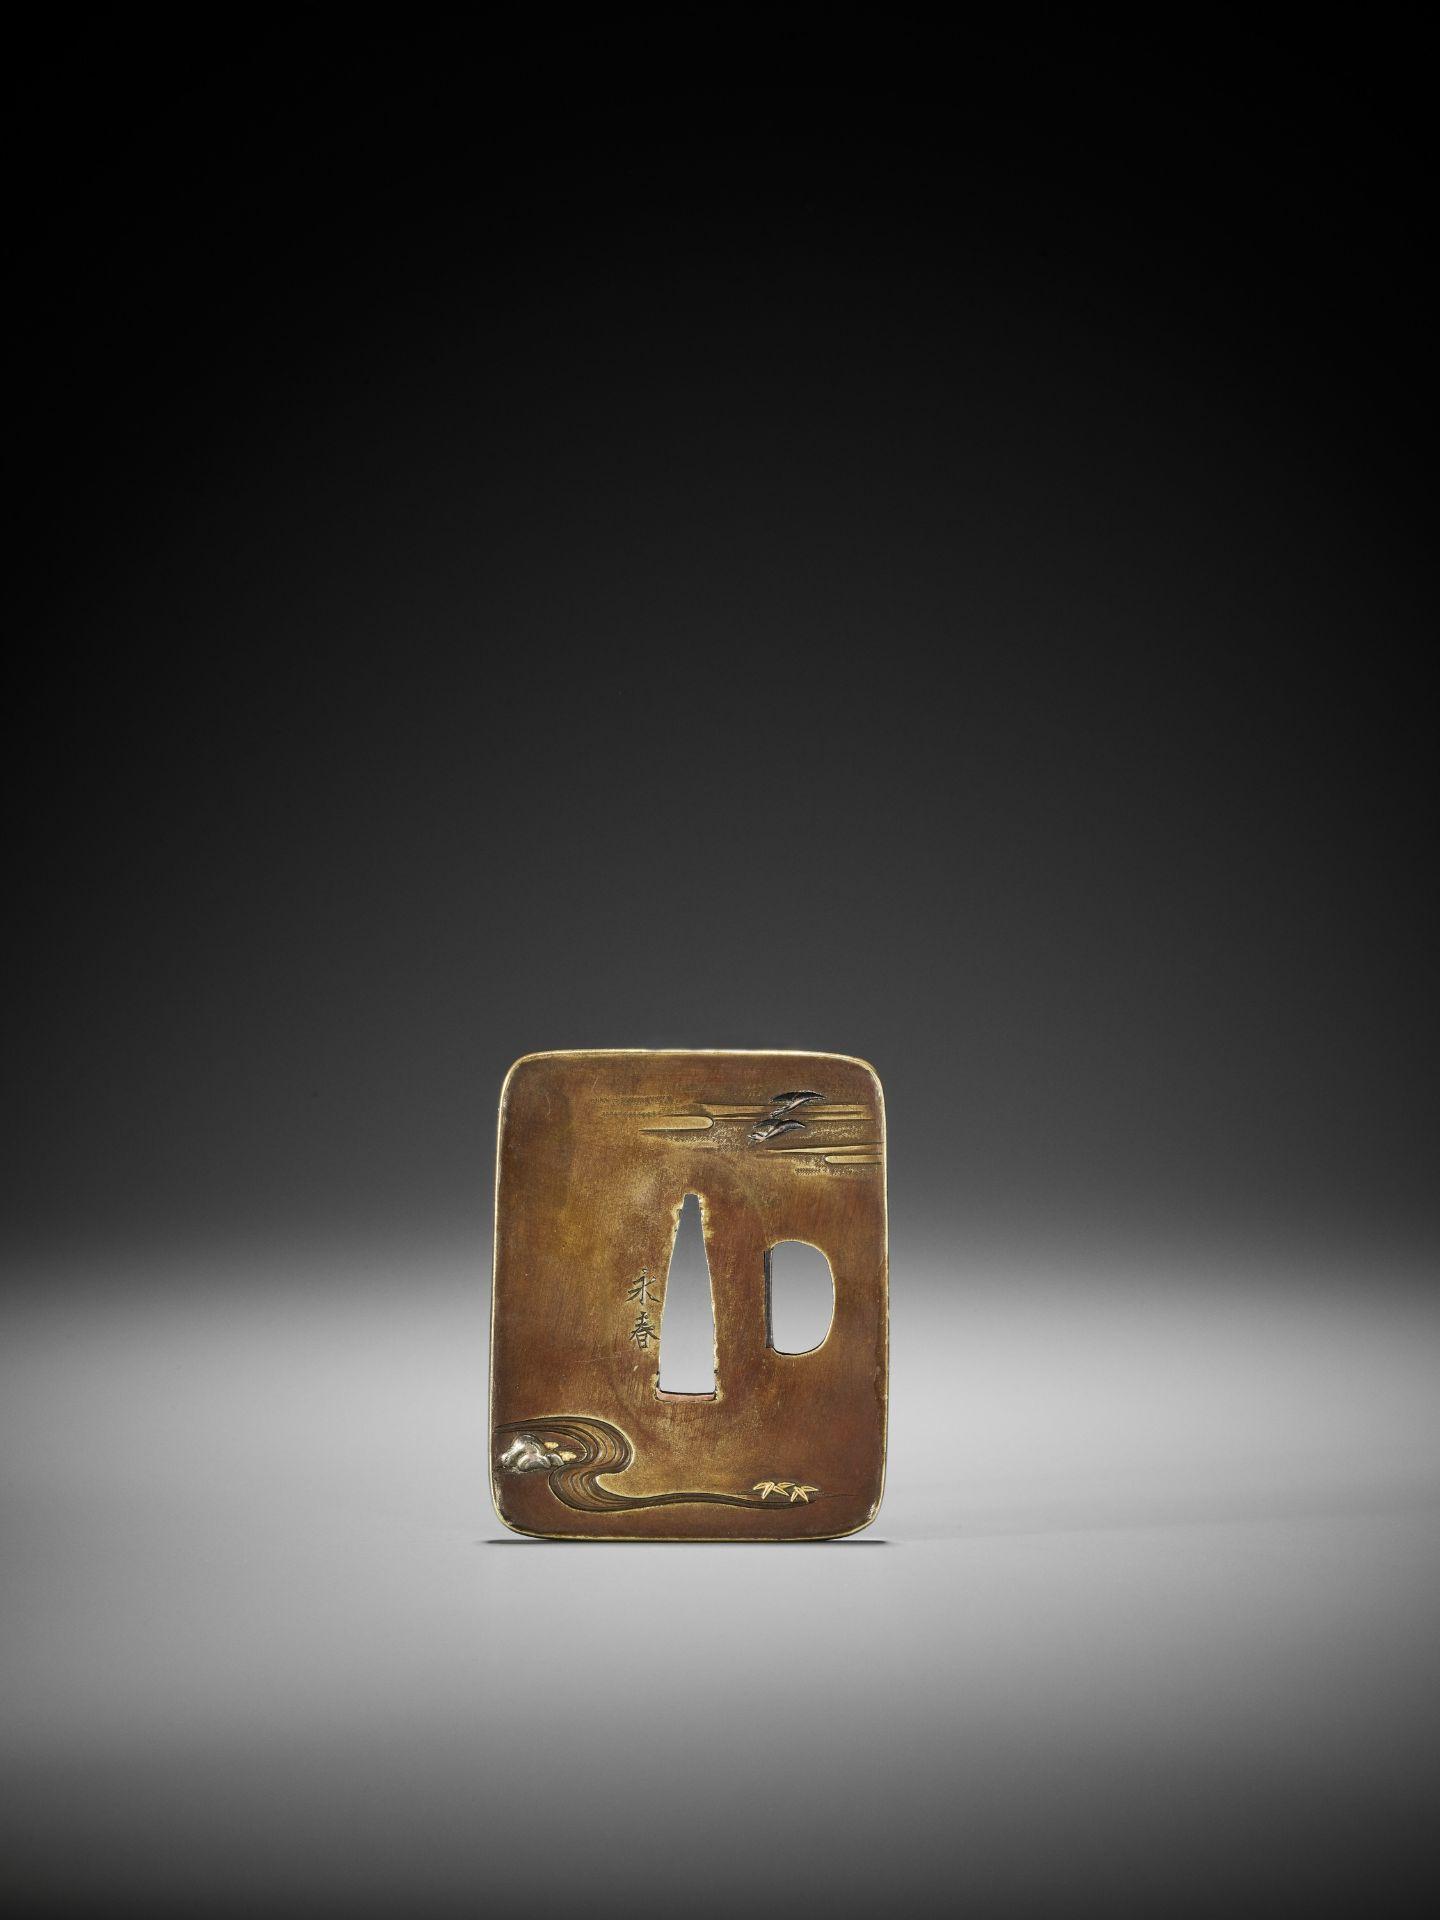 NAGAHARU: A SENTOKU TSUBA DEPICTING GEESE AND MOON - Image 2 of 4